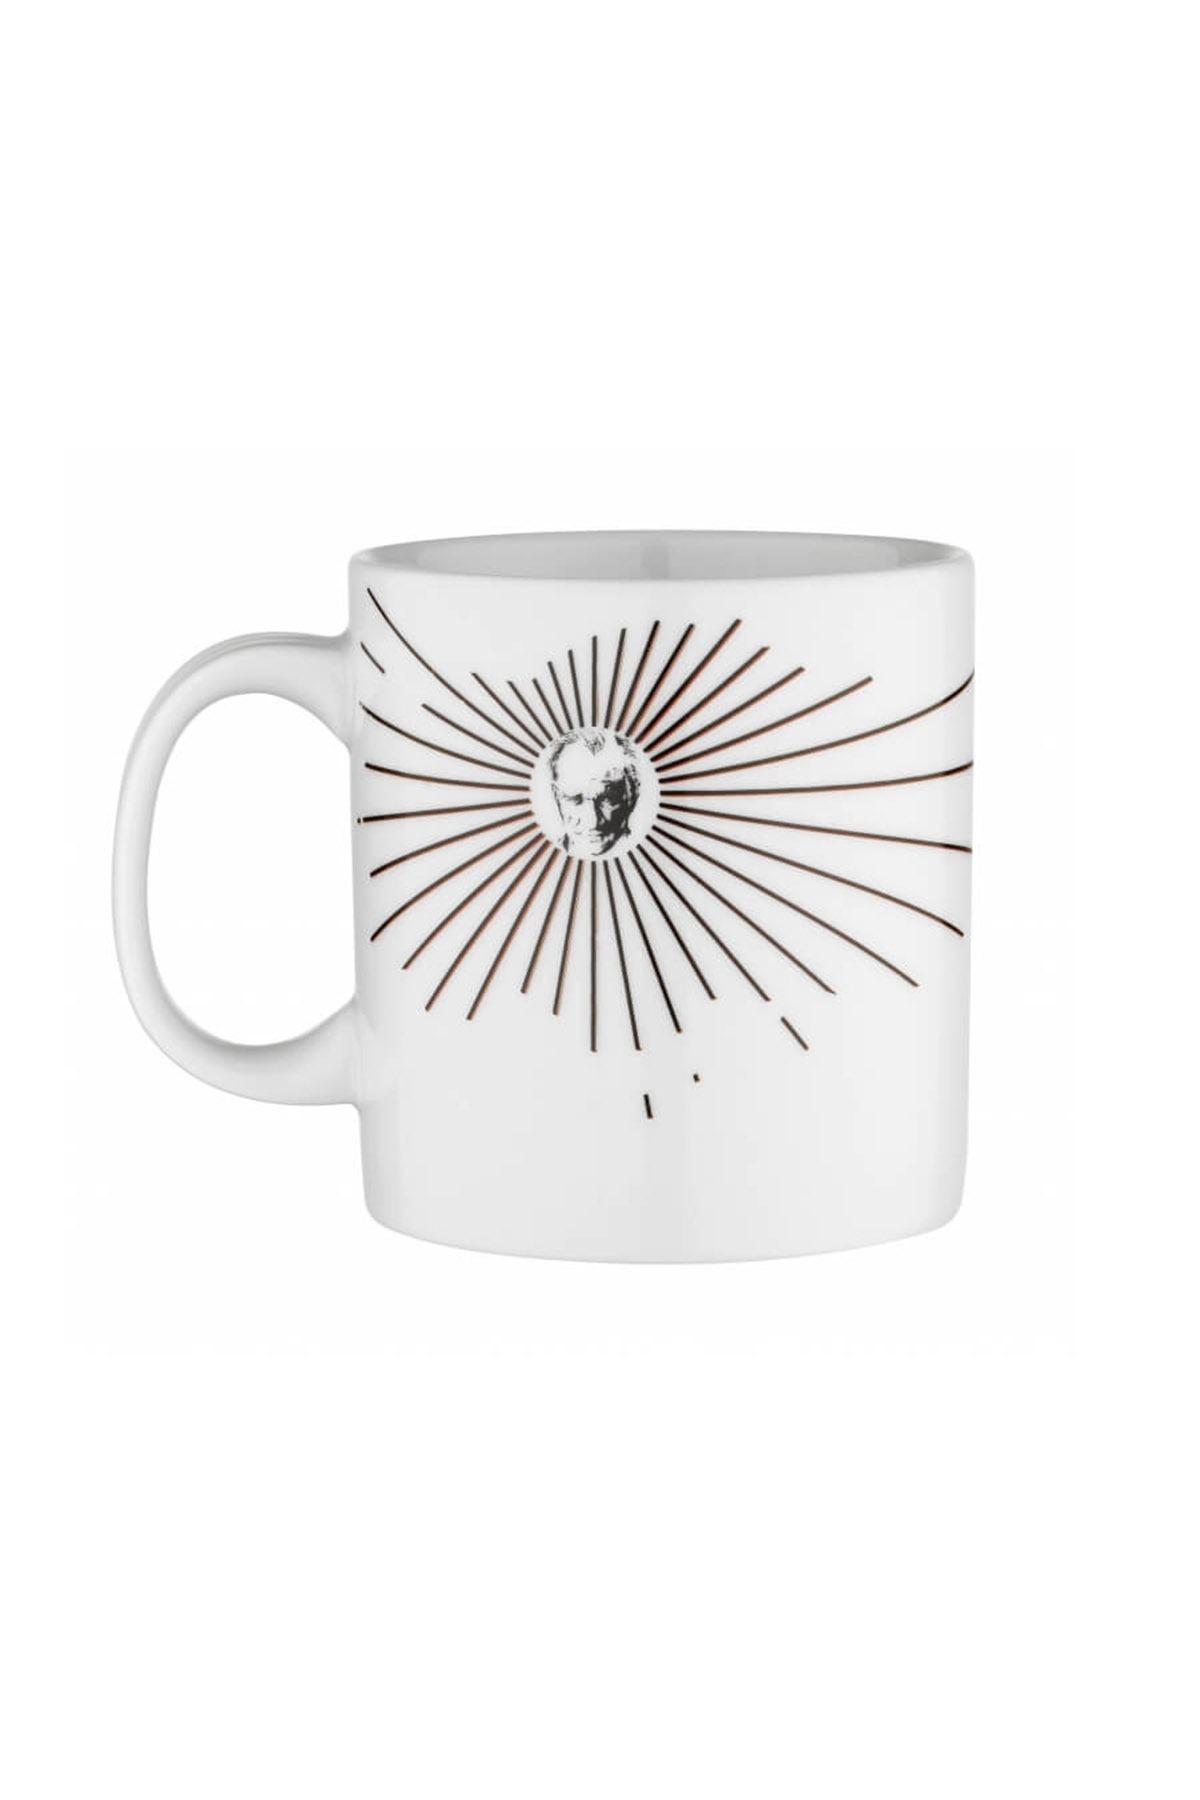 KÜTAHYA PORSELEN - Kütahya Porselen Mug Bardak Special Coll. Atatürk 10432